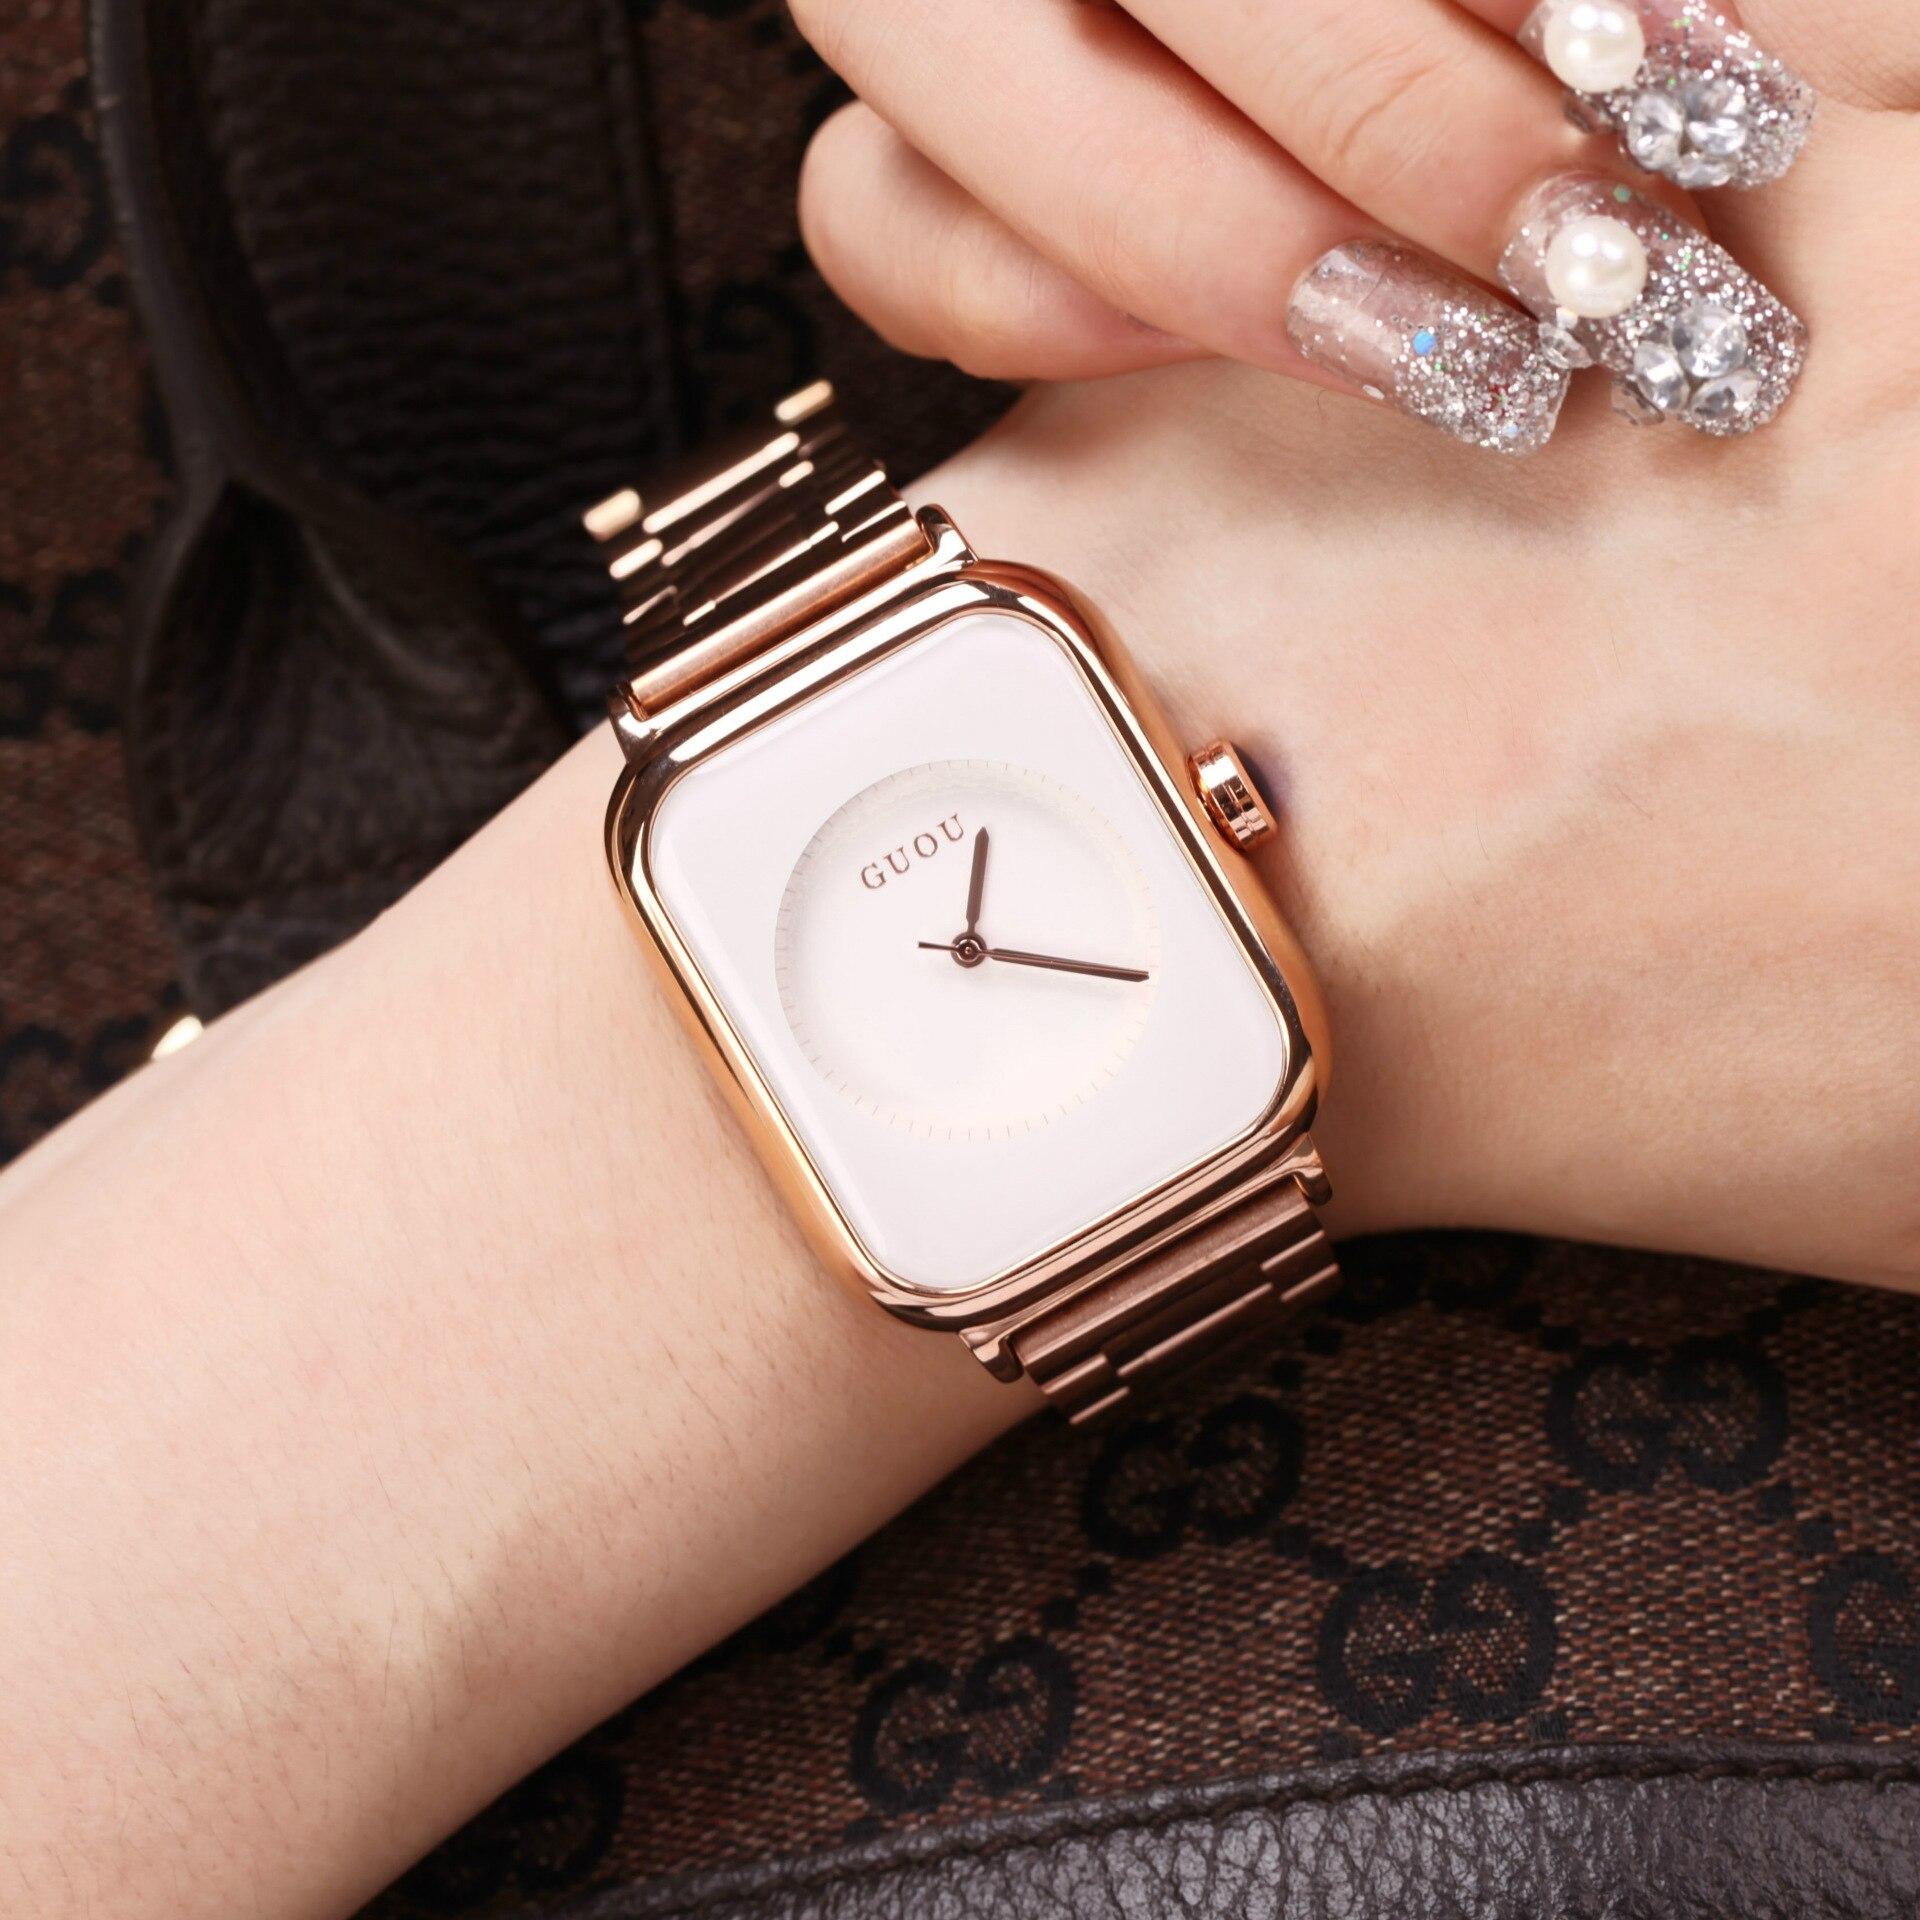 Relojes Para Mujer Women Watches Square Fashion Korean Version of The Leisure Girls Watch Water Resistant Quartz Luxury Gifts enlarge